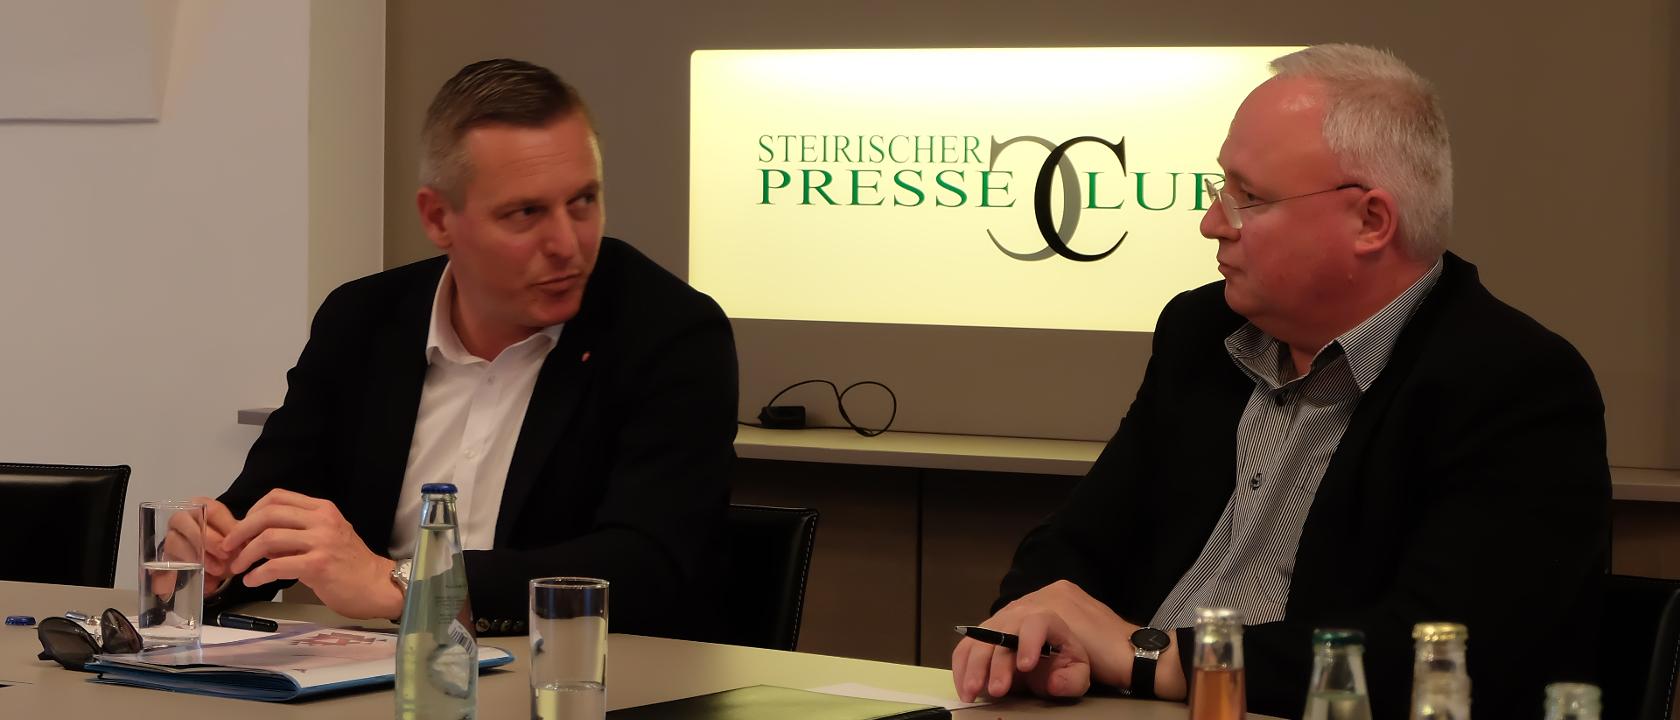 Mario-Kunasek-Heinz-M-Fischer-im-Infight-Tisch-Presseclub-Graz